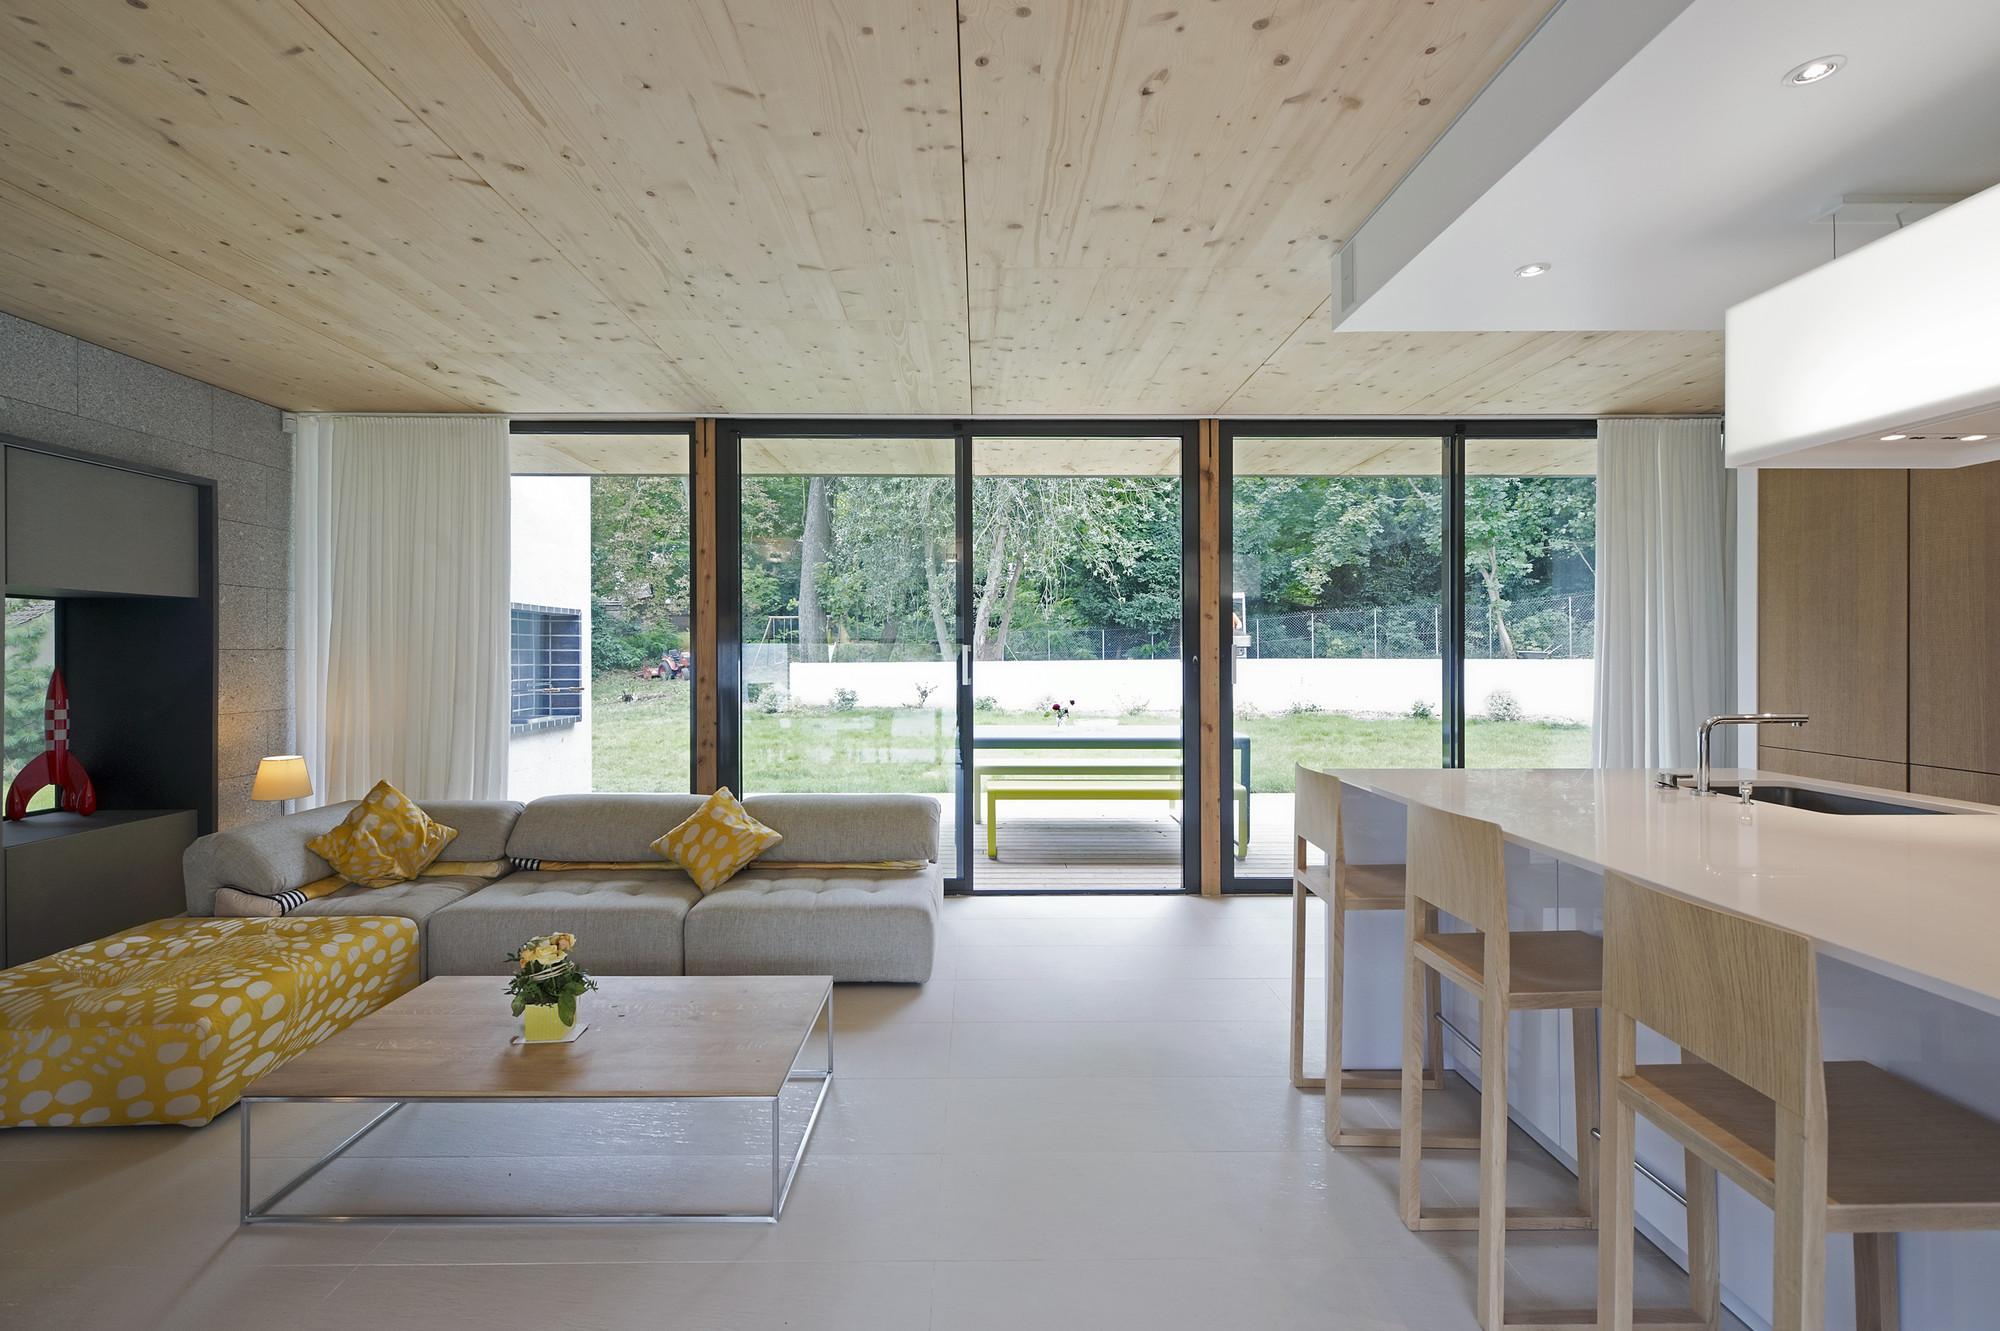 War house a b architectes dplg archdaily for Construire maison minimaliste